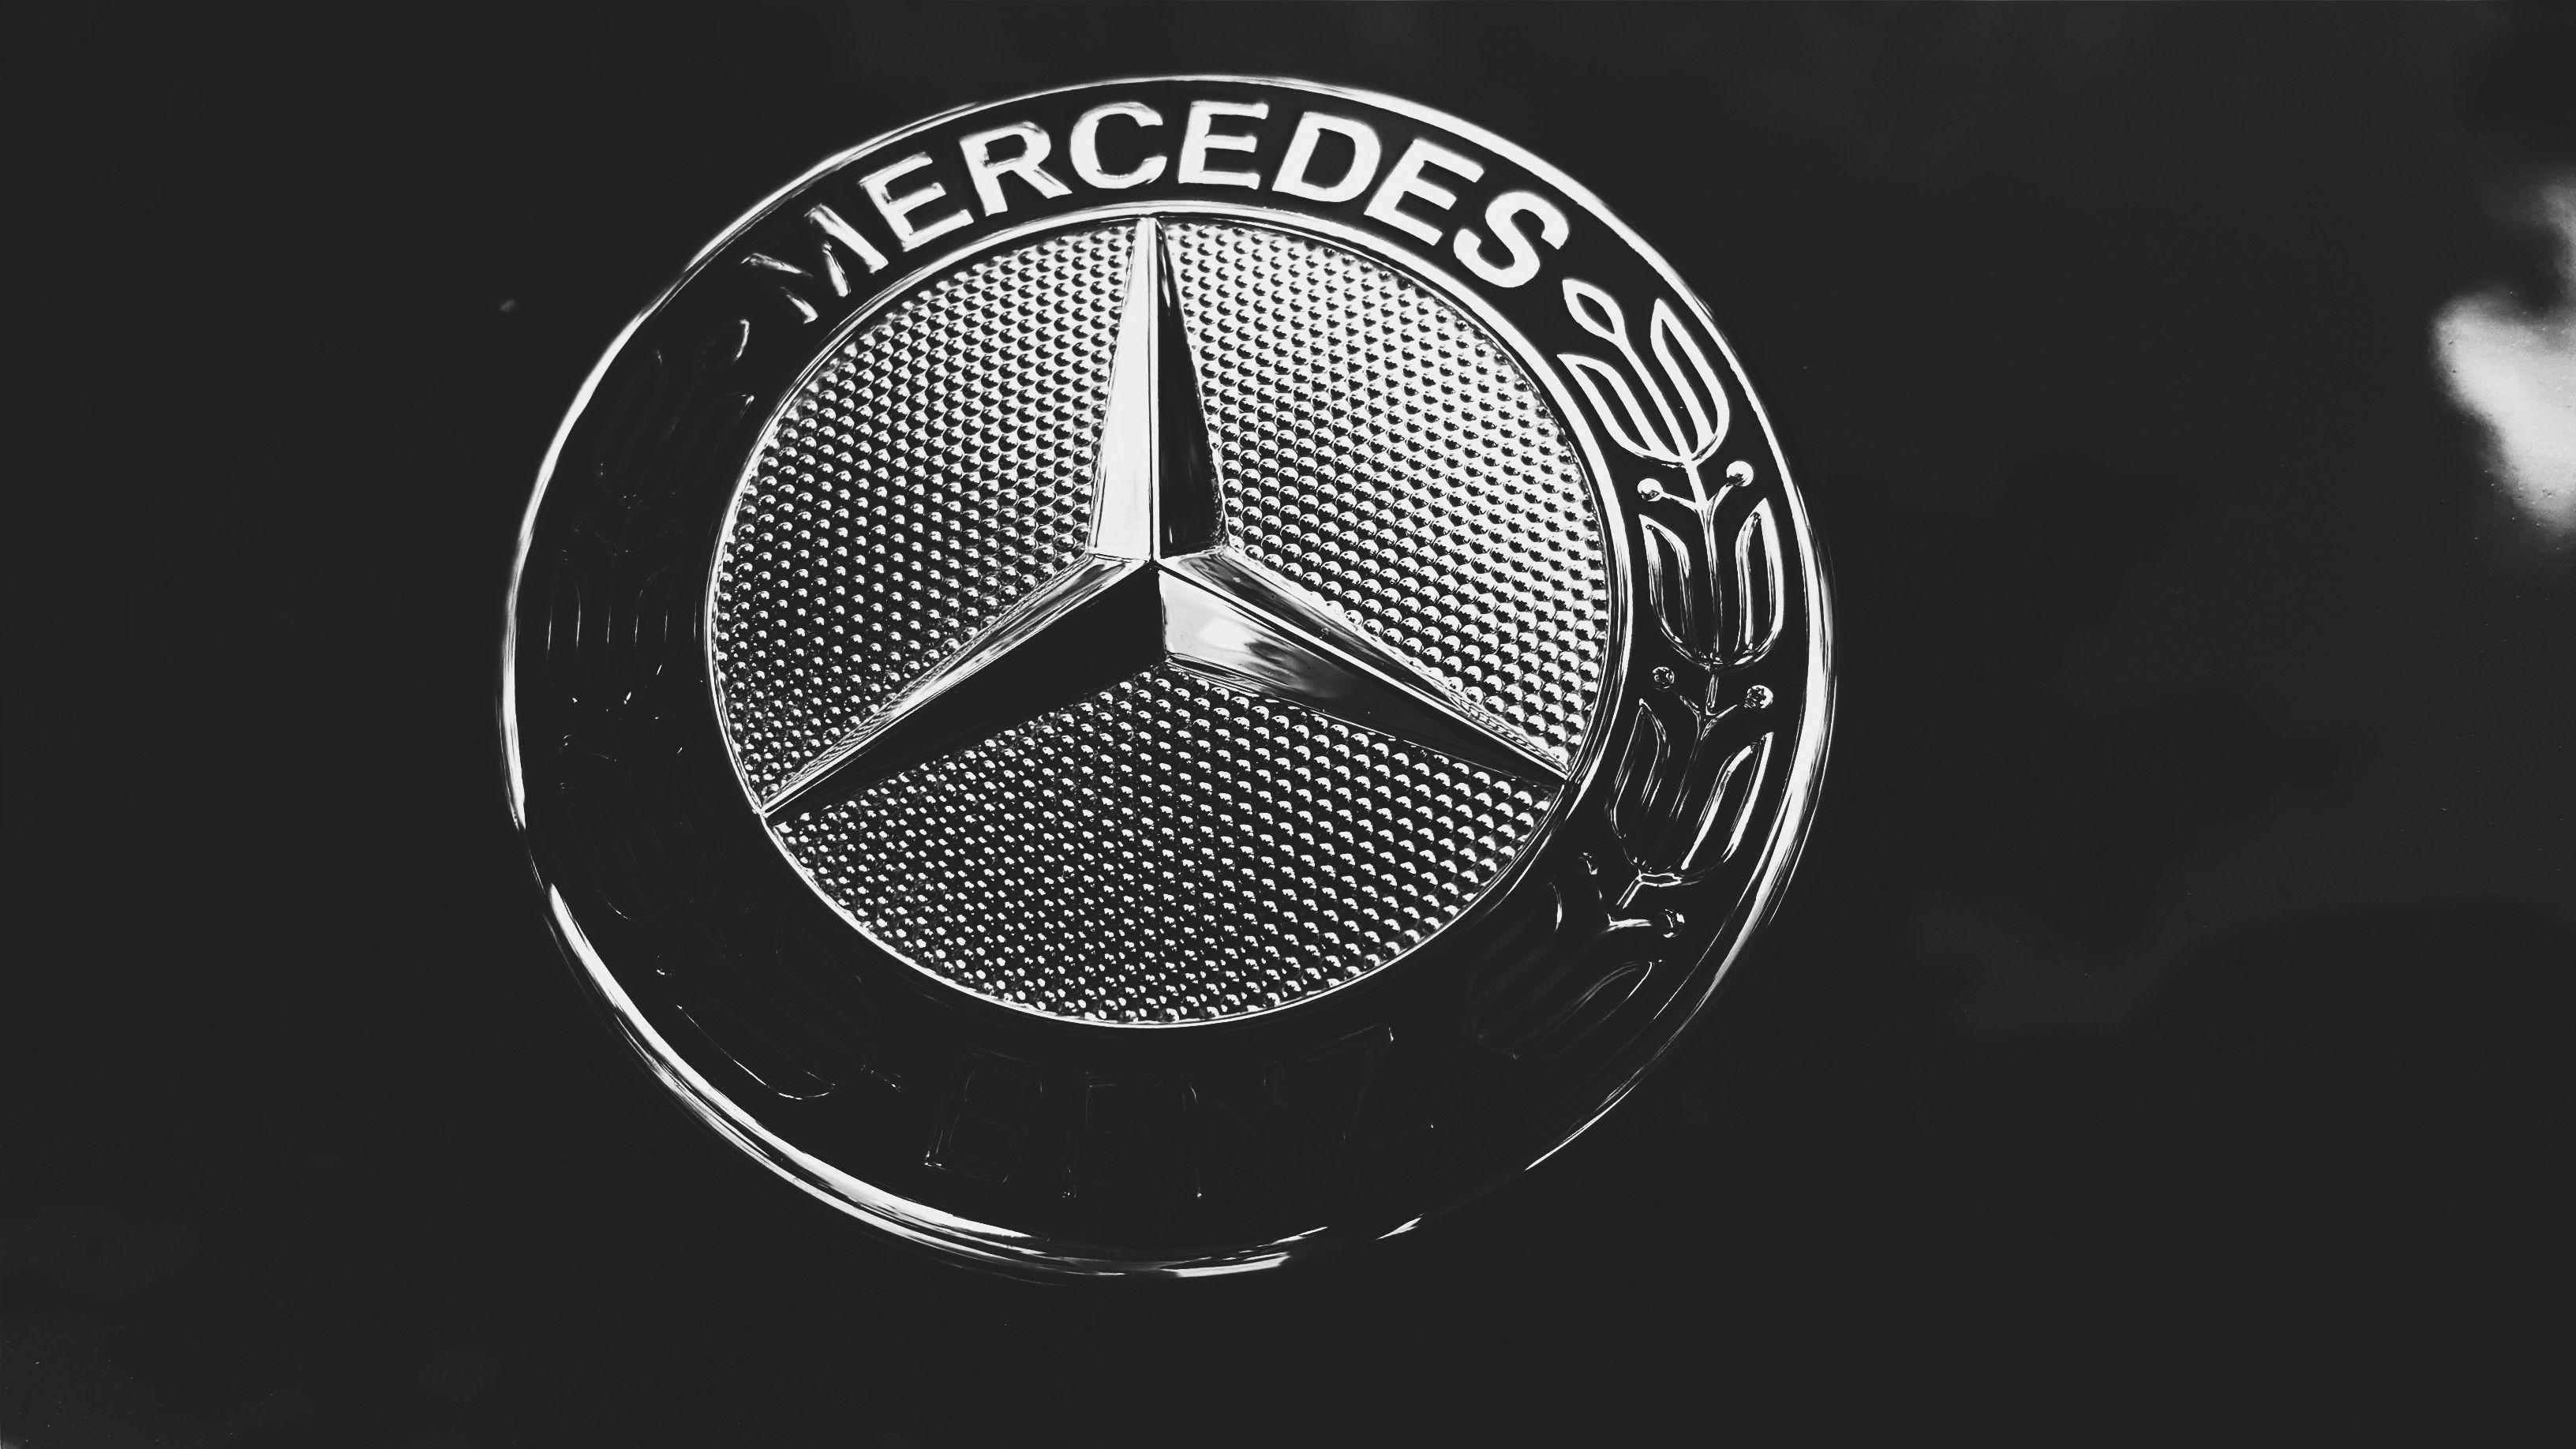 Mercedes Logo Wallpapers Top Free Mercedes Logo